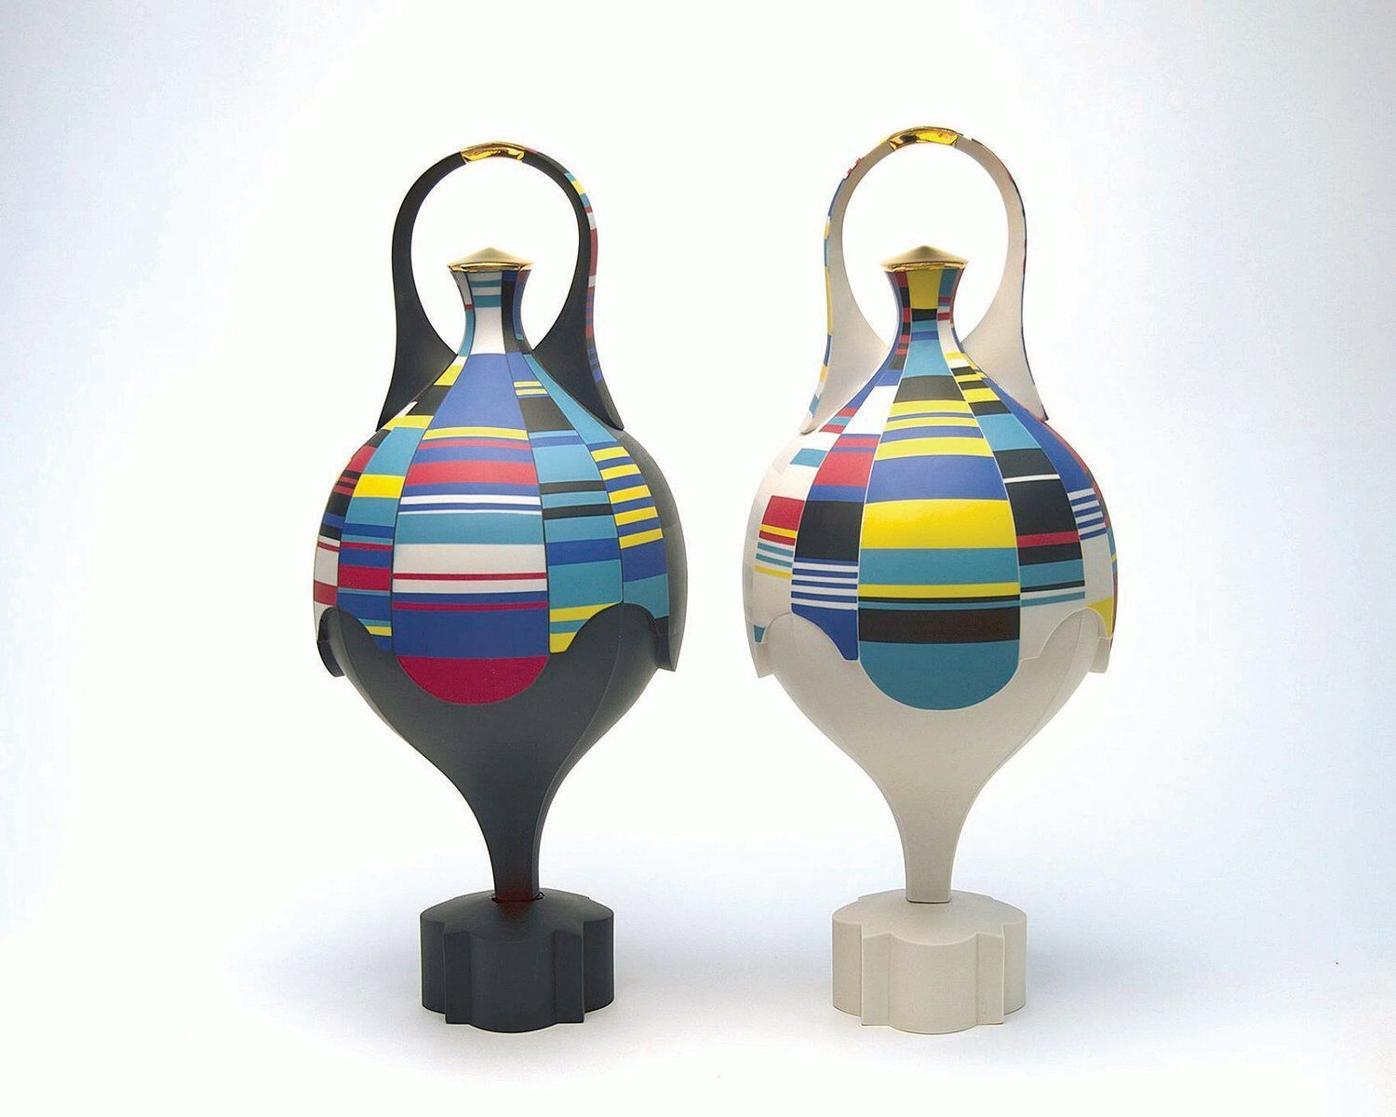 Ferrin Contemporary: Ceramic artist Peter Pincus draws inspiration from LeWitt retrospective